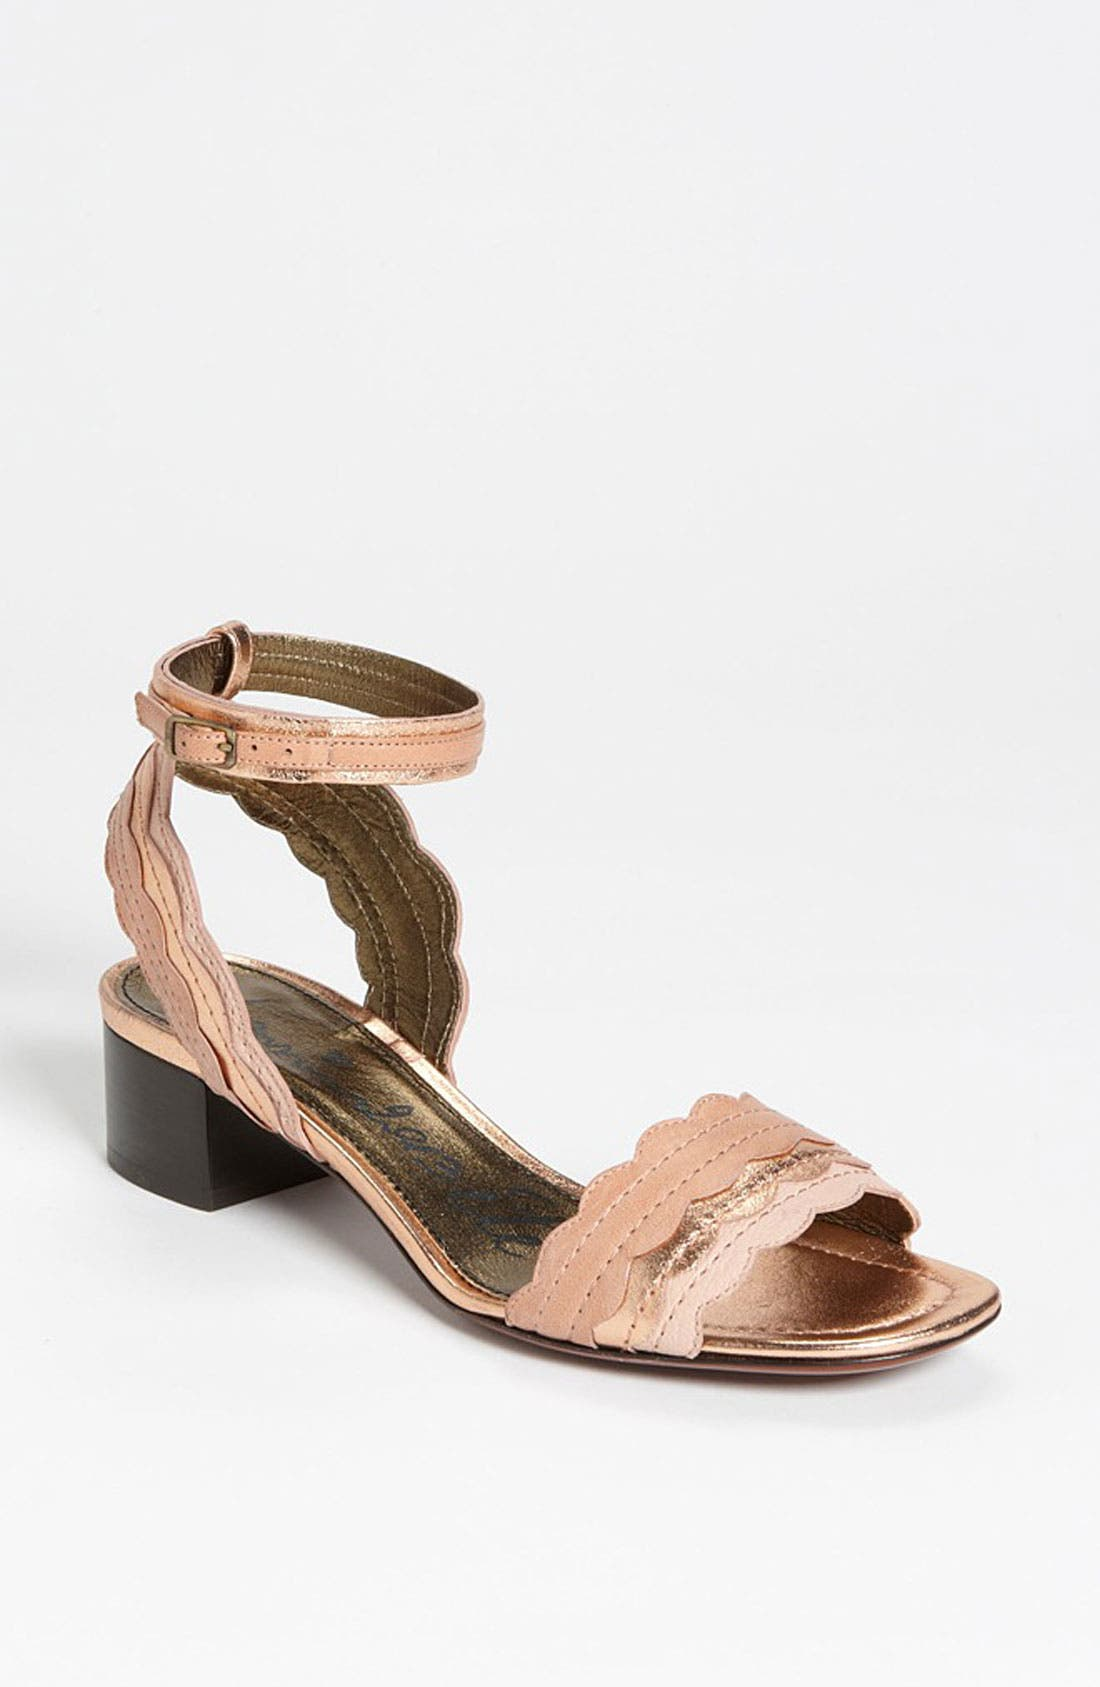 Main Image - Lanvin 'Chunky' Sandal